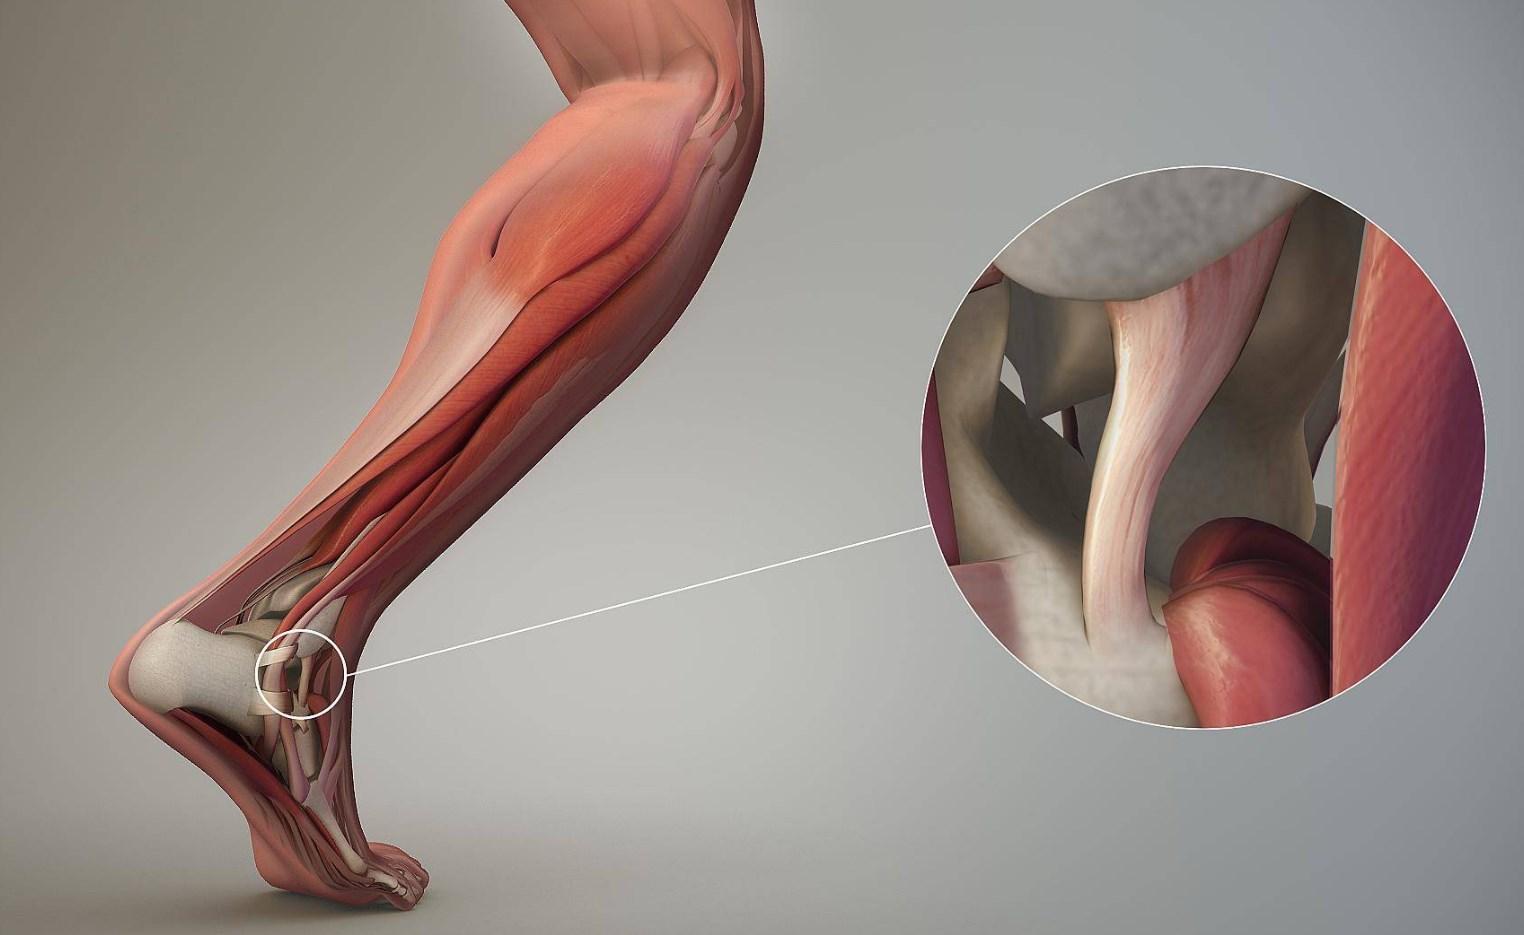 Расятжение связок голеностопа